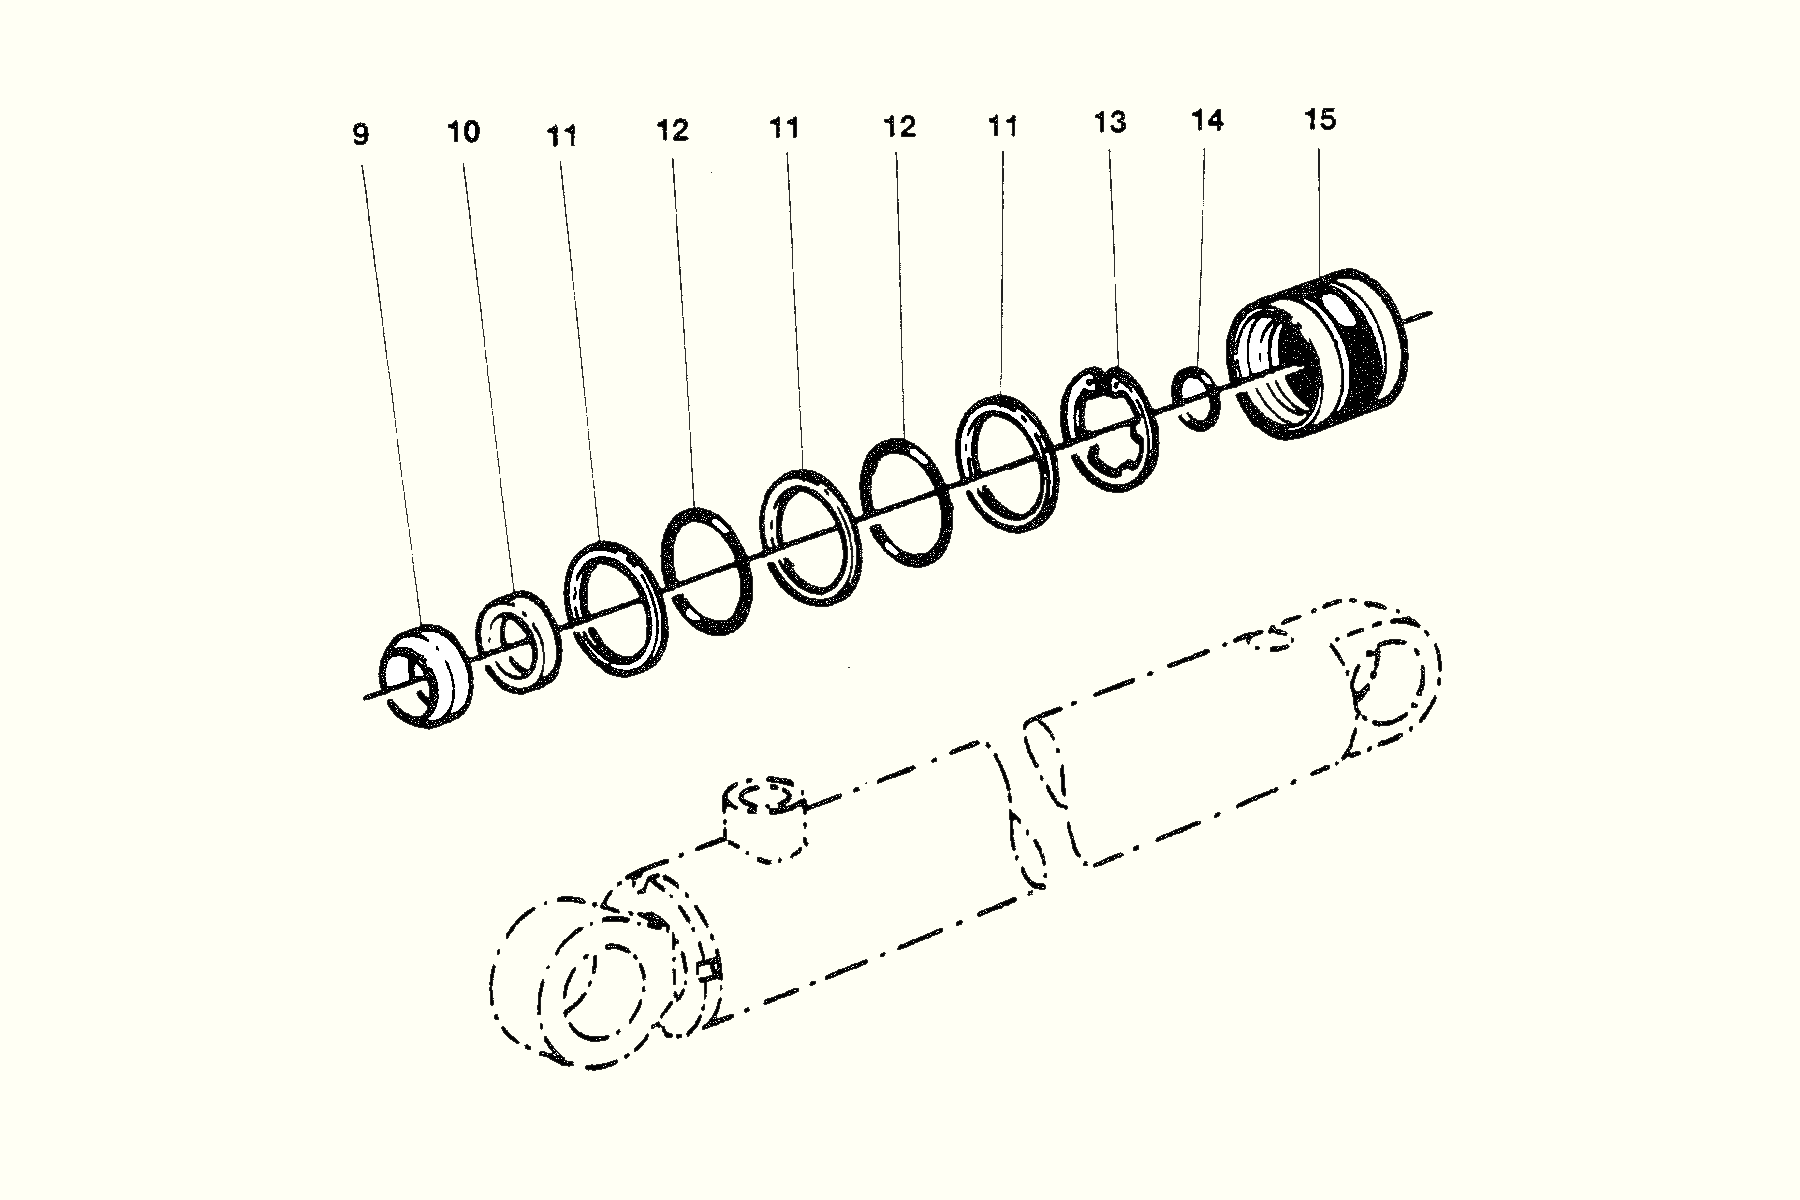 Damping Cylinder Repair kit HÄggo NR: 353 6264-601 Price: 531 SEK